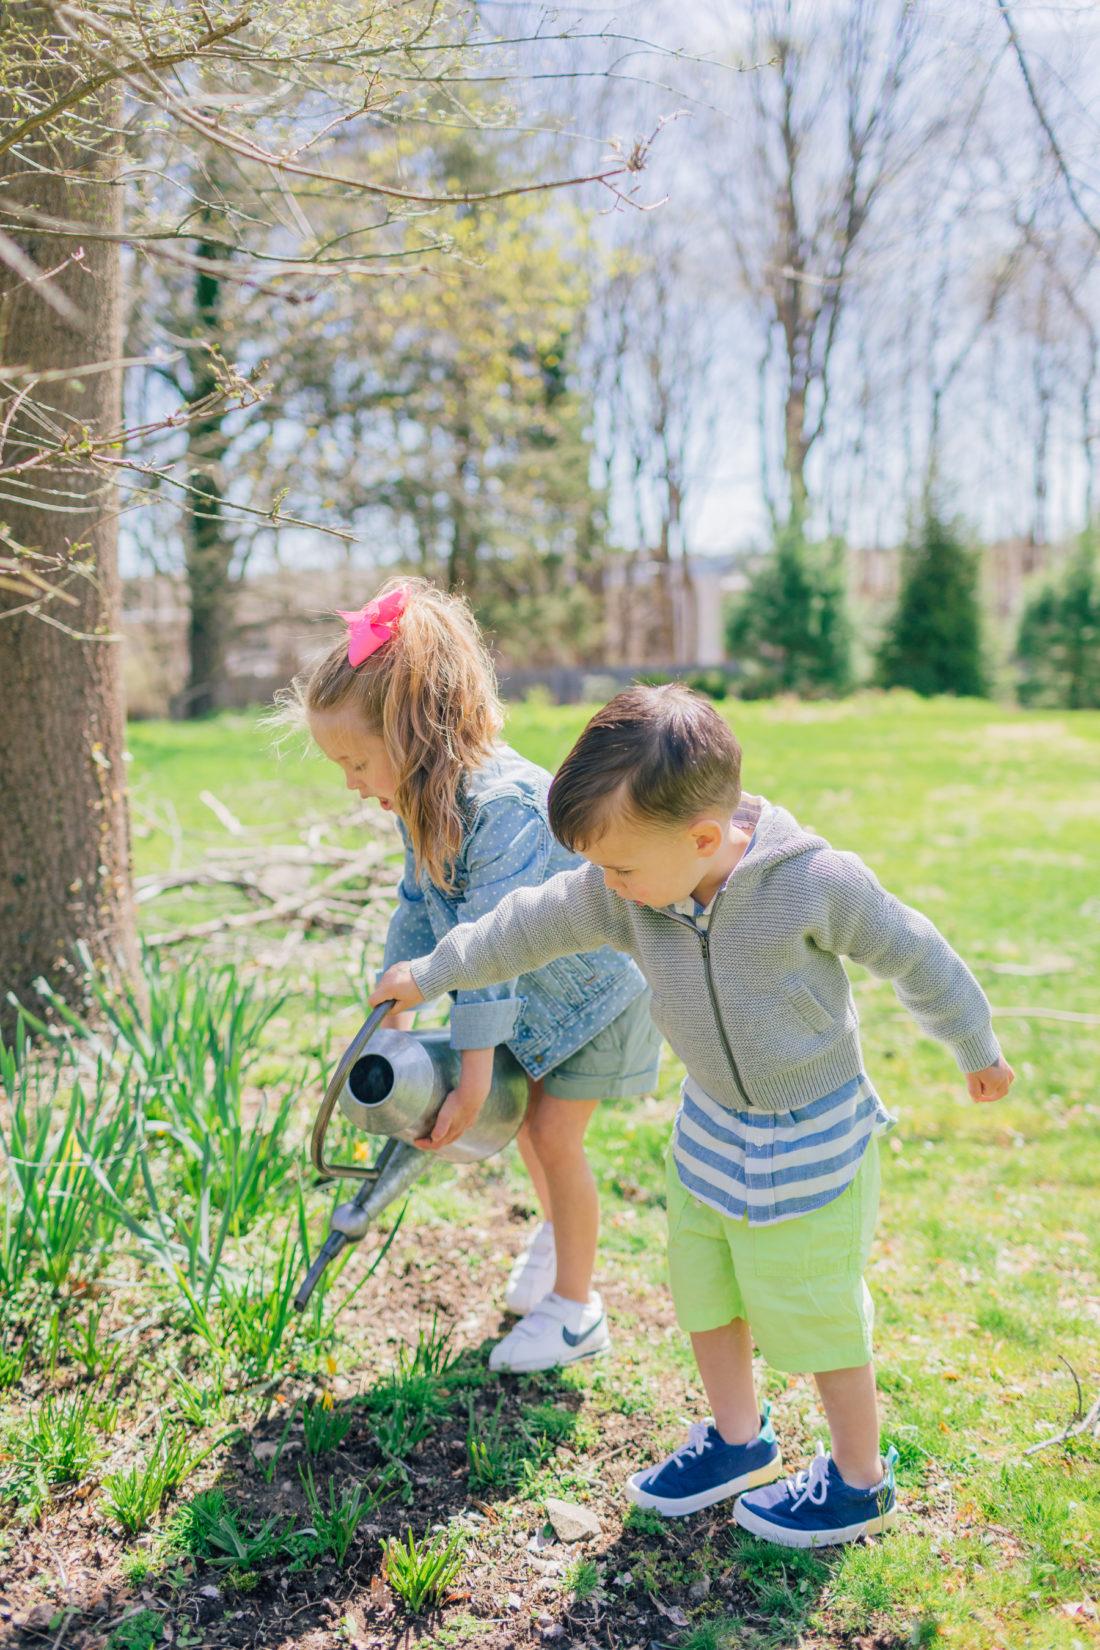 Eva Amurri Martino's daughter Marlowe and son Major water their garden in her spring style picks